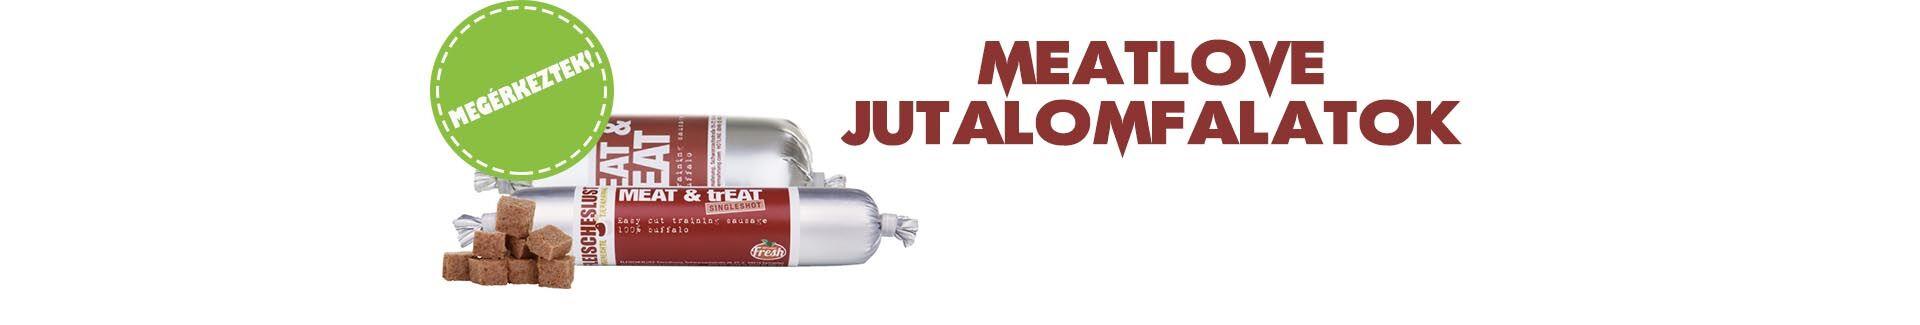 meatandtreat